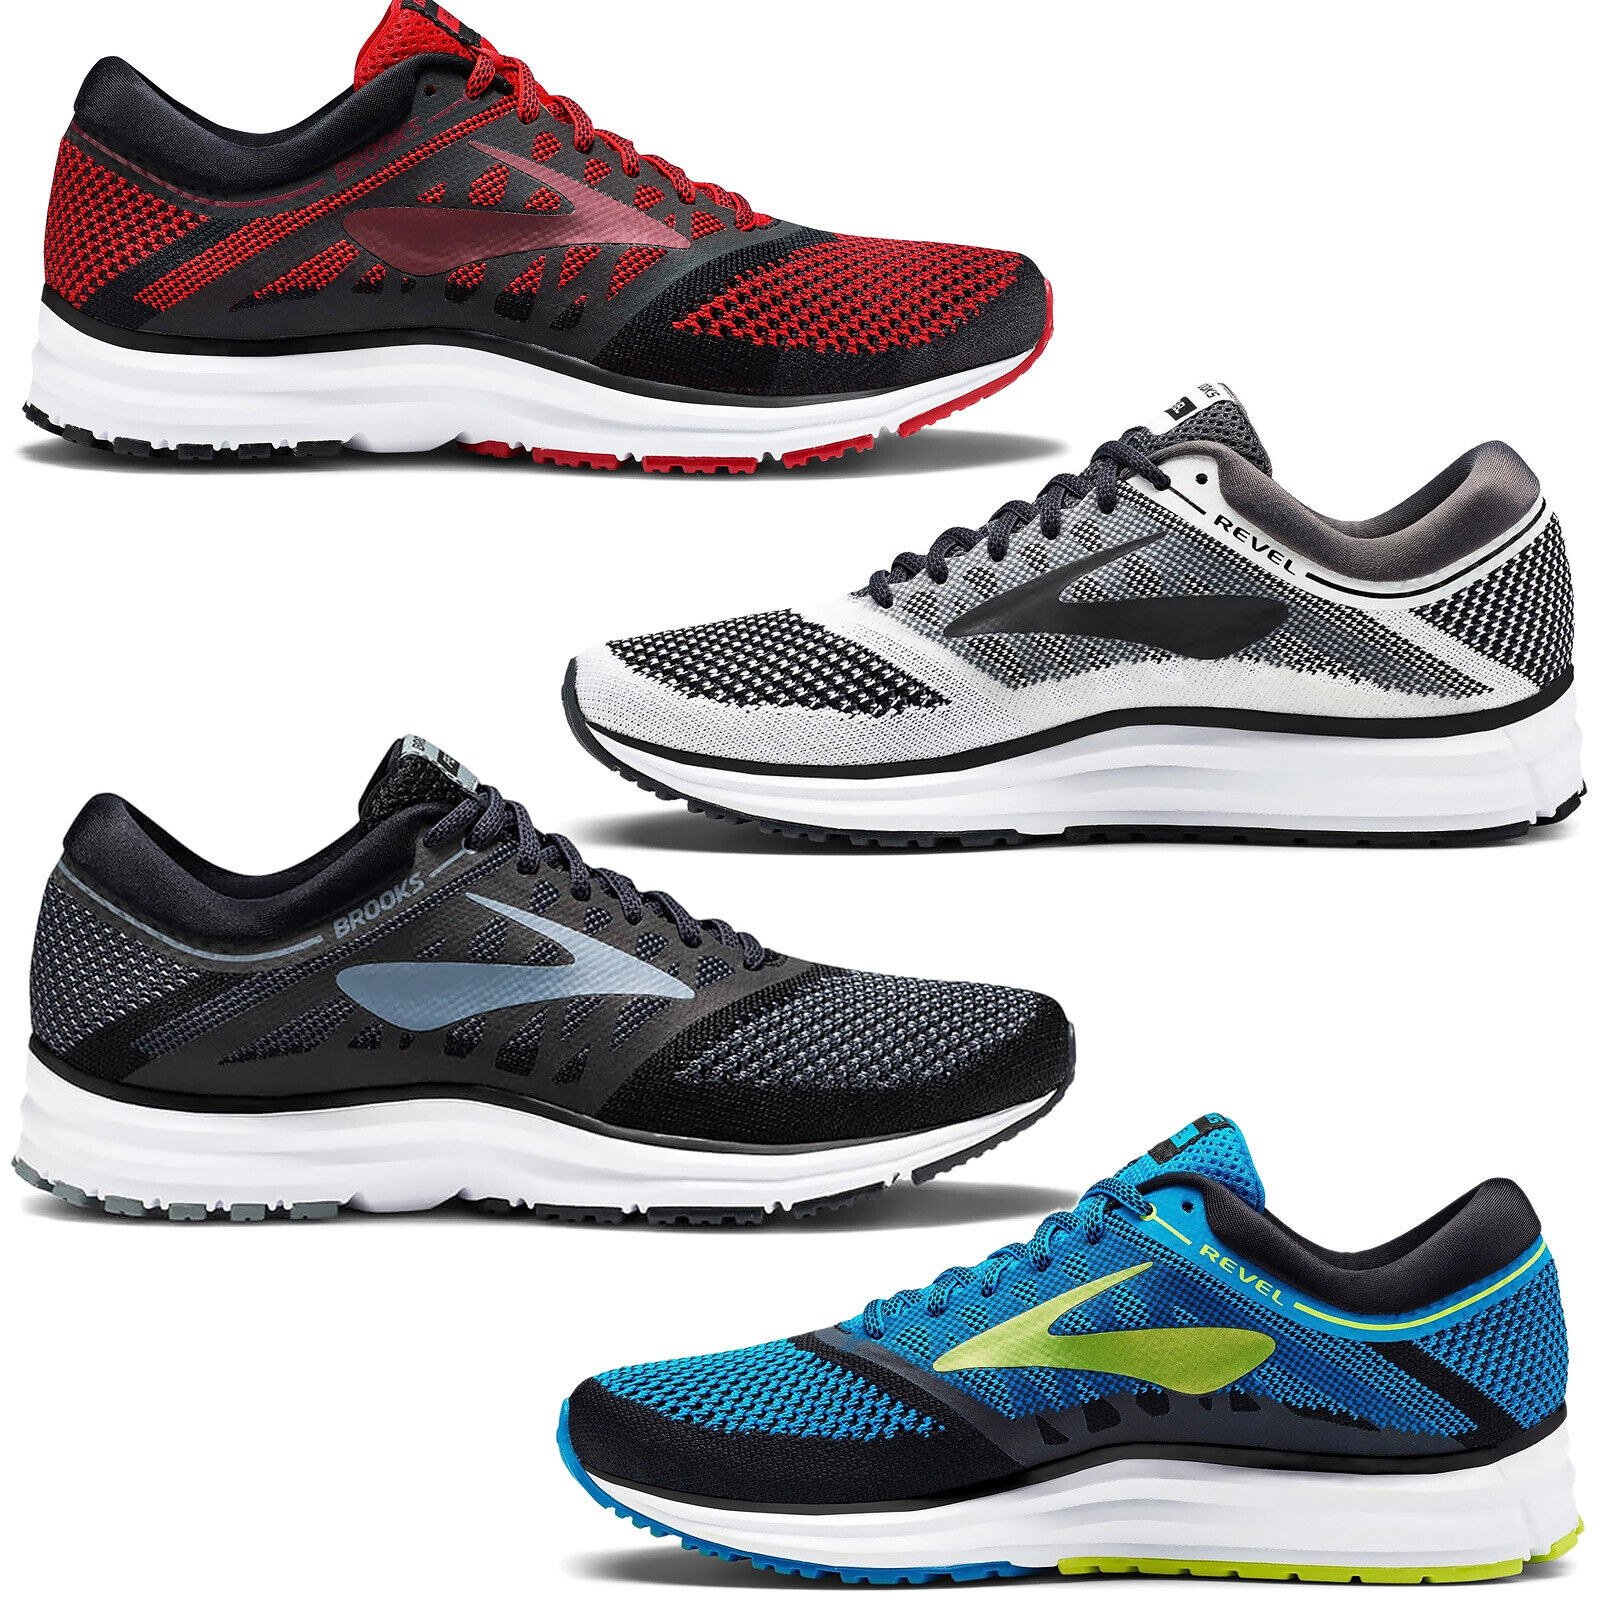 New BROOKS Revel Knit Road Running Shoes, Mens Sizes